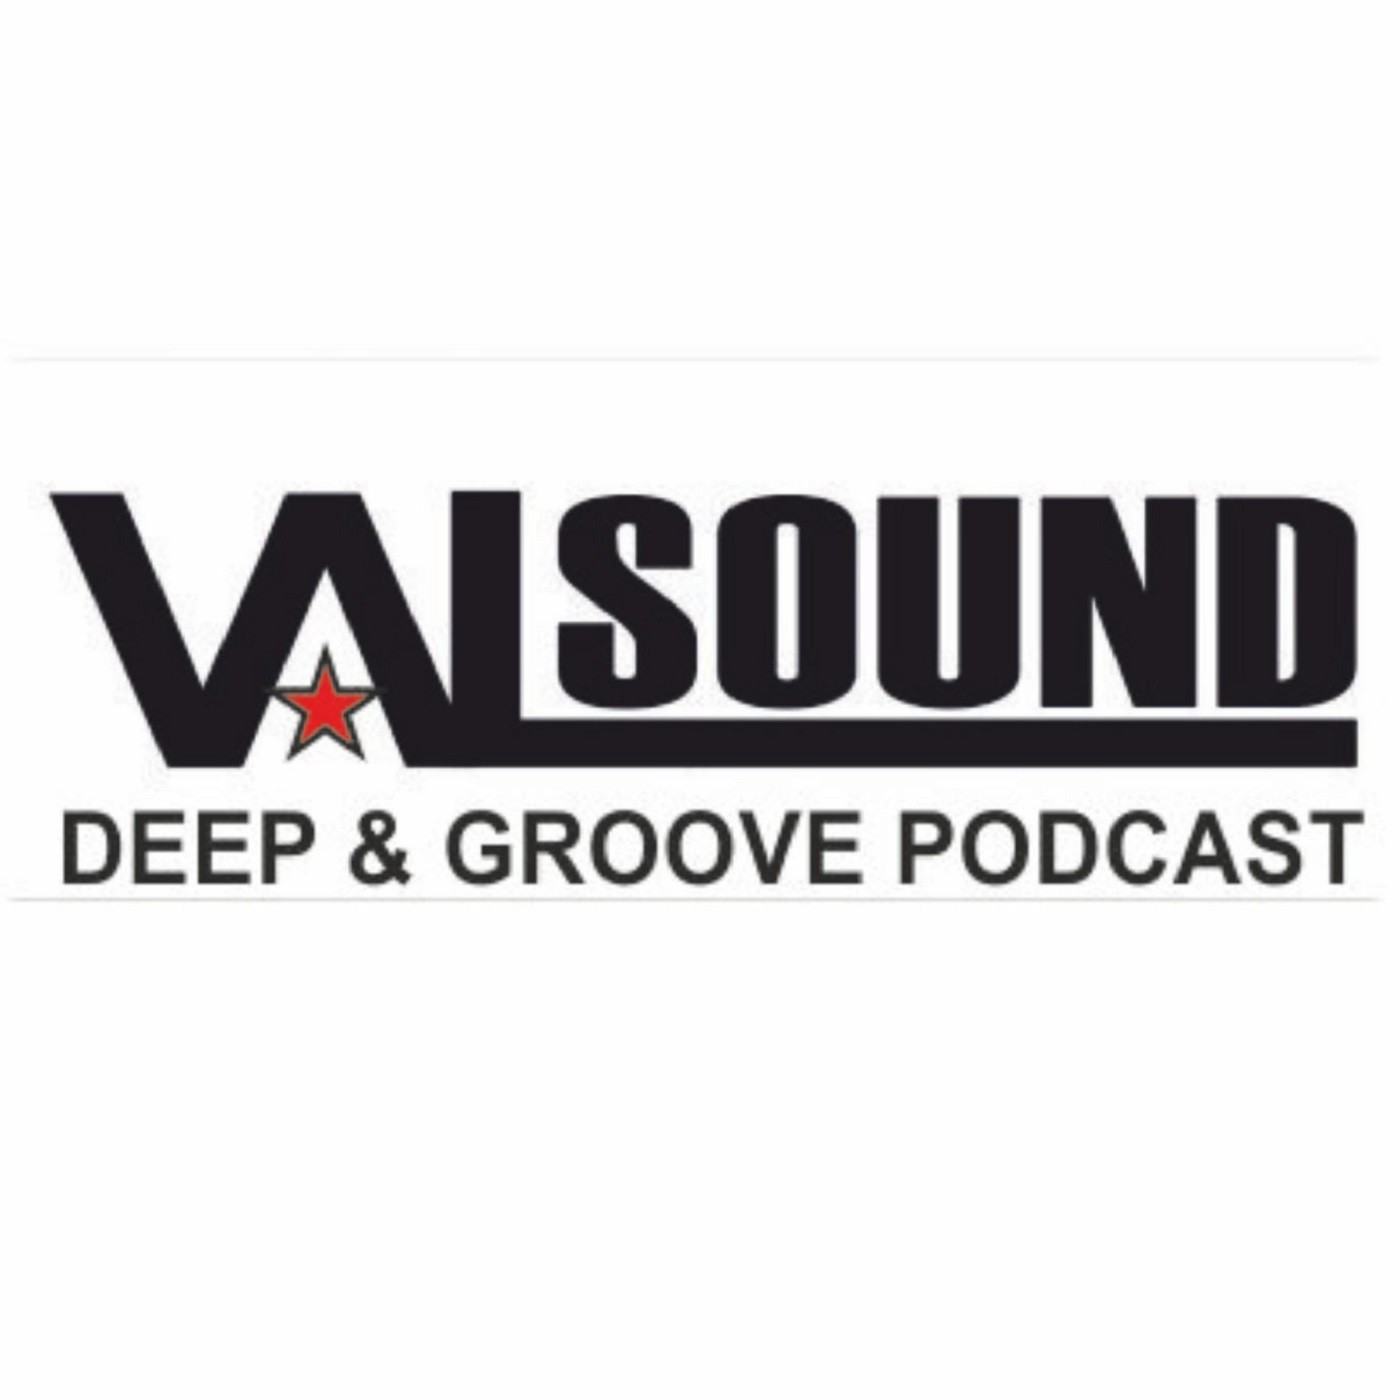 VAL SOUND